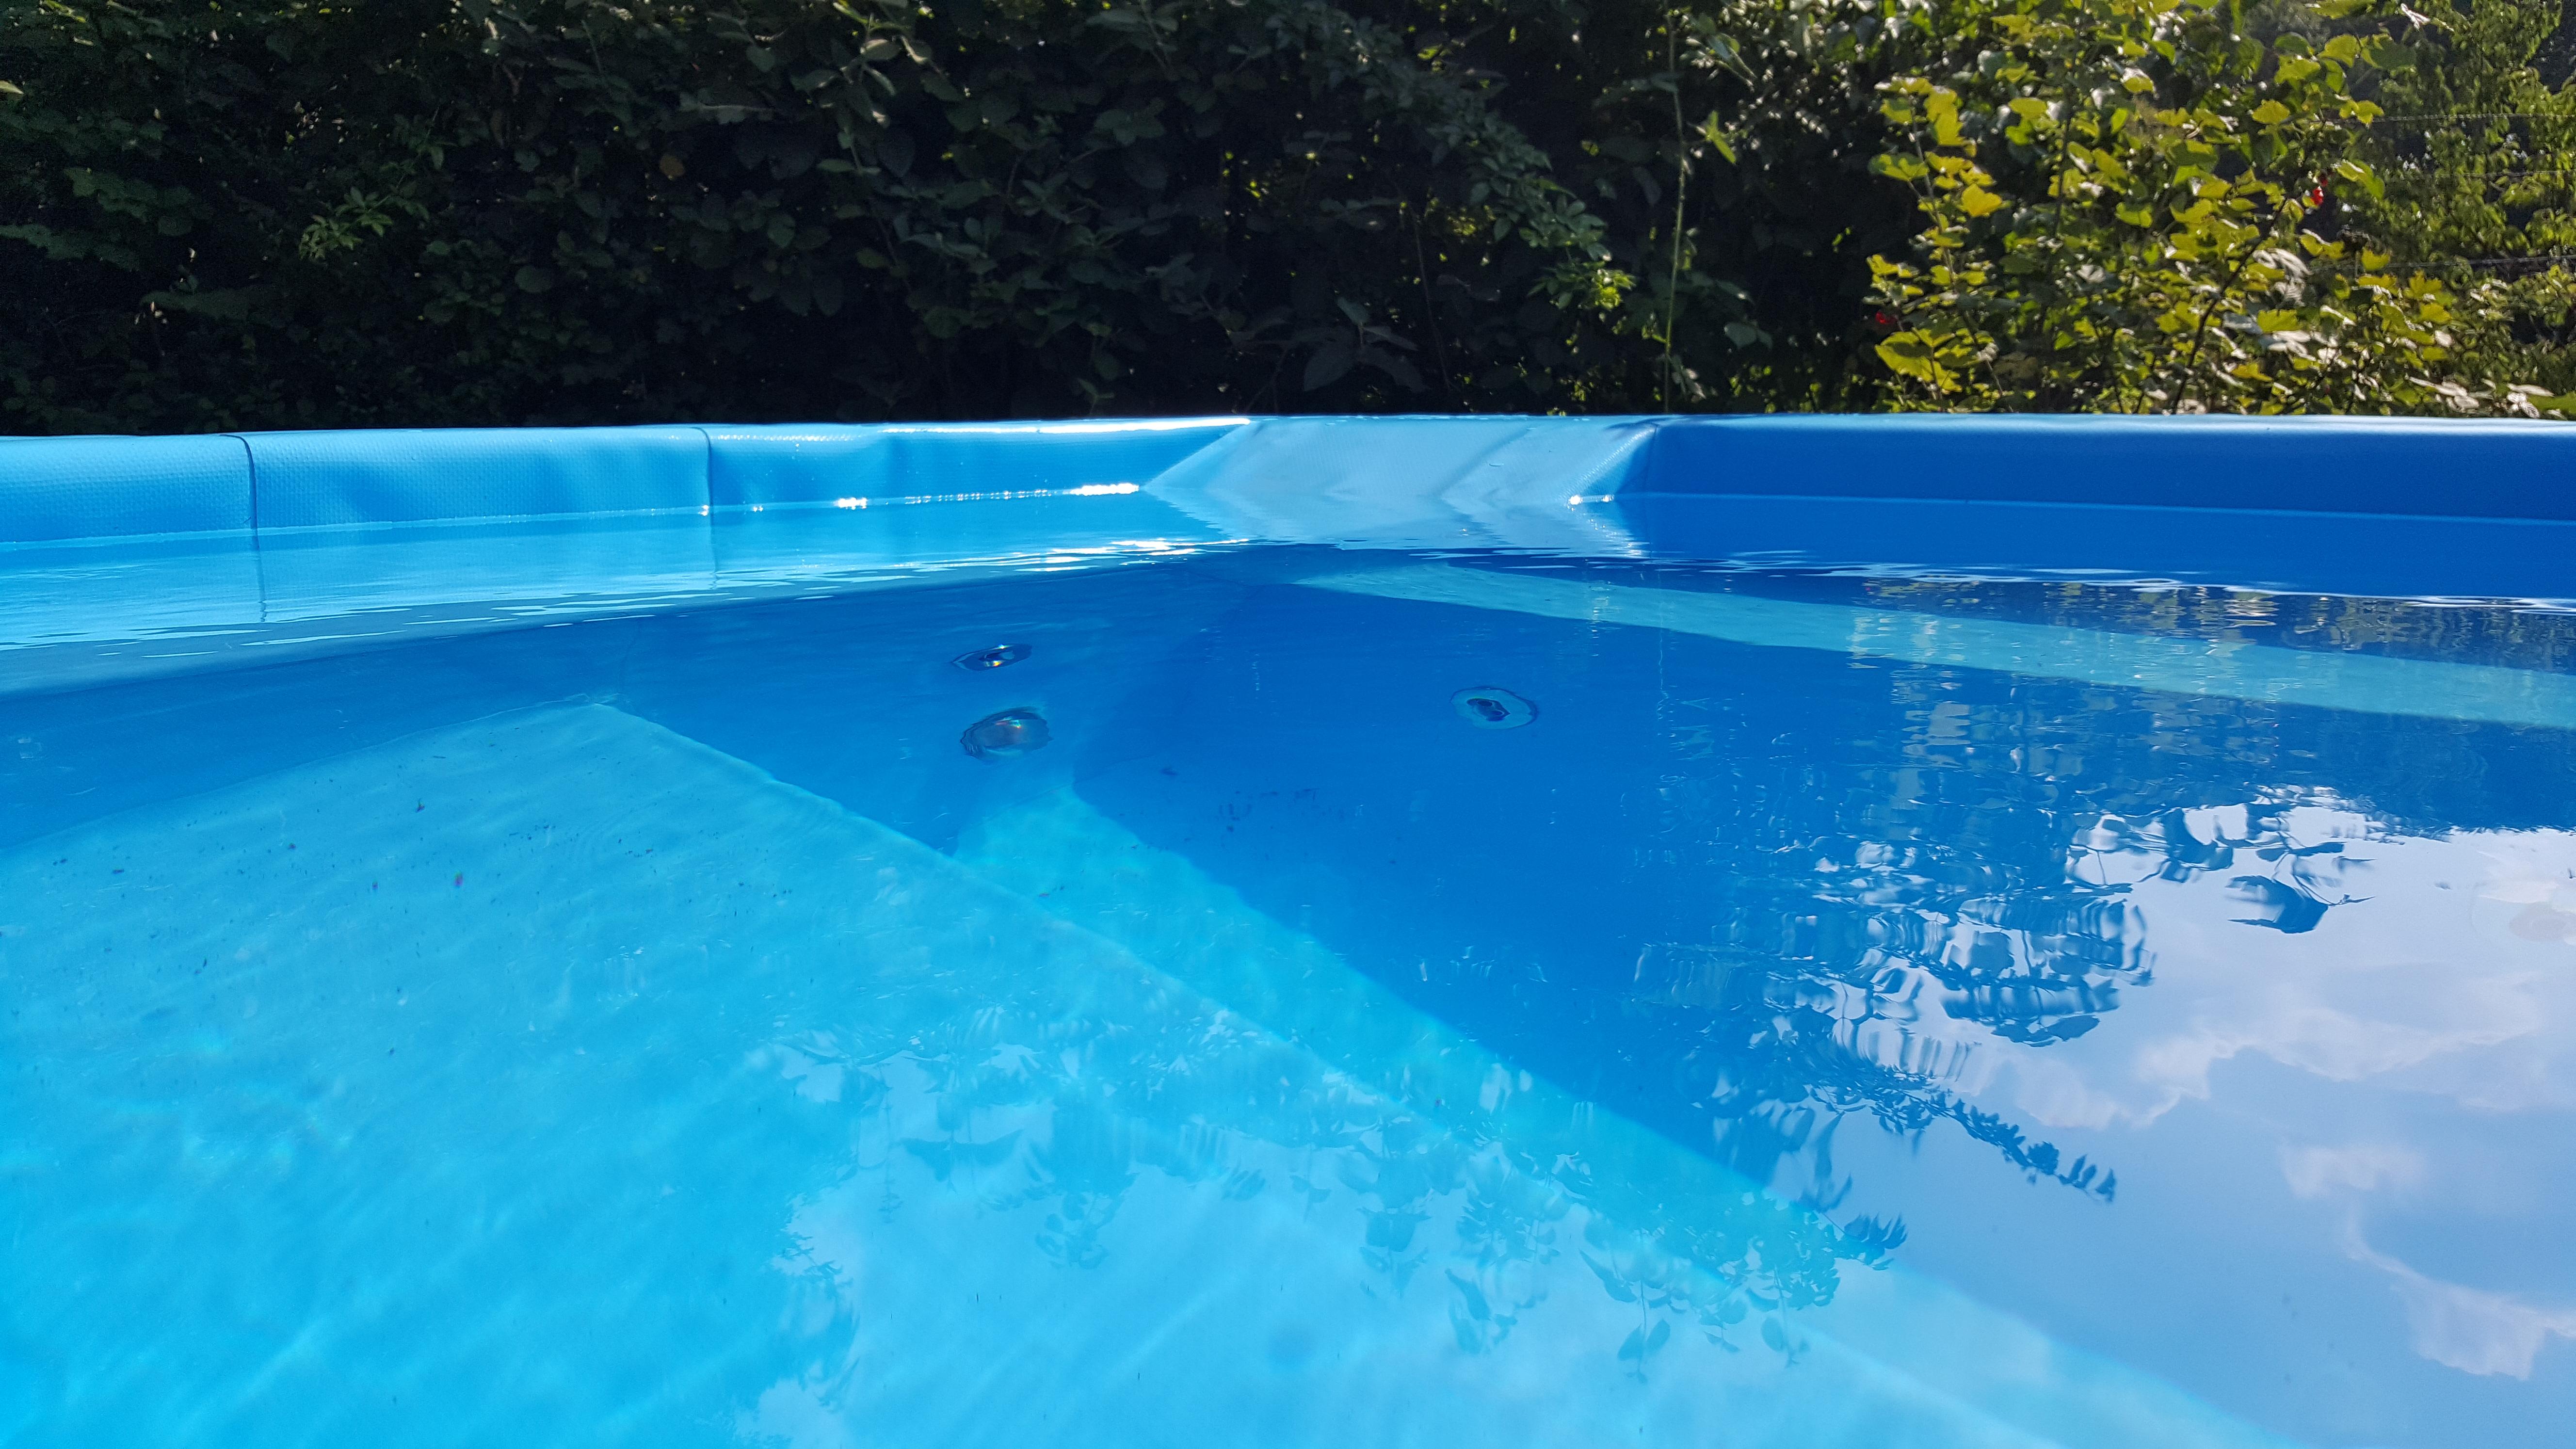 Wasser im Pool - Whirlpool selber bauen